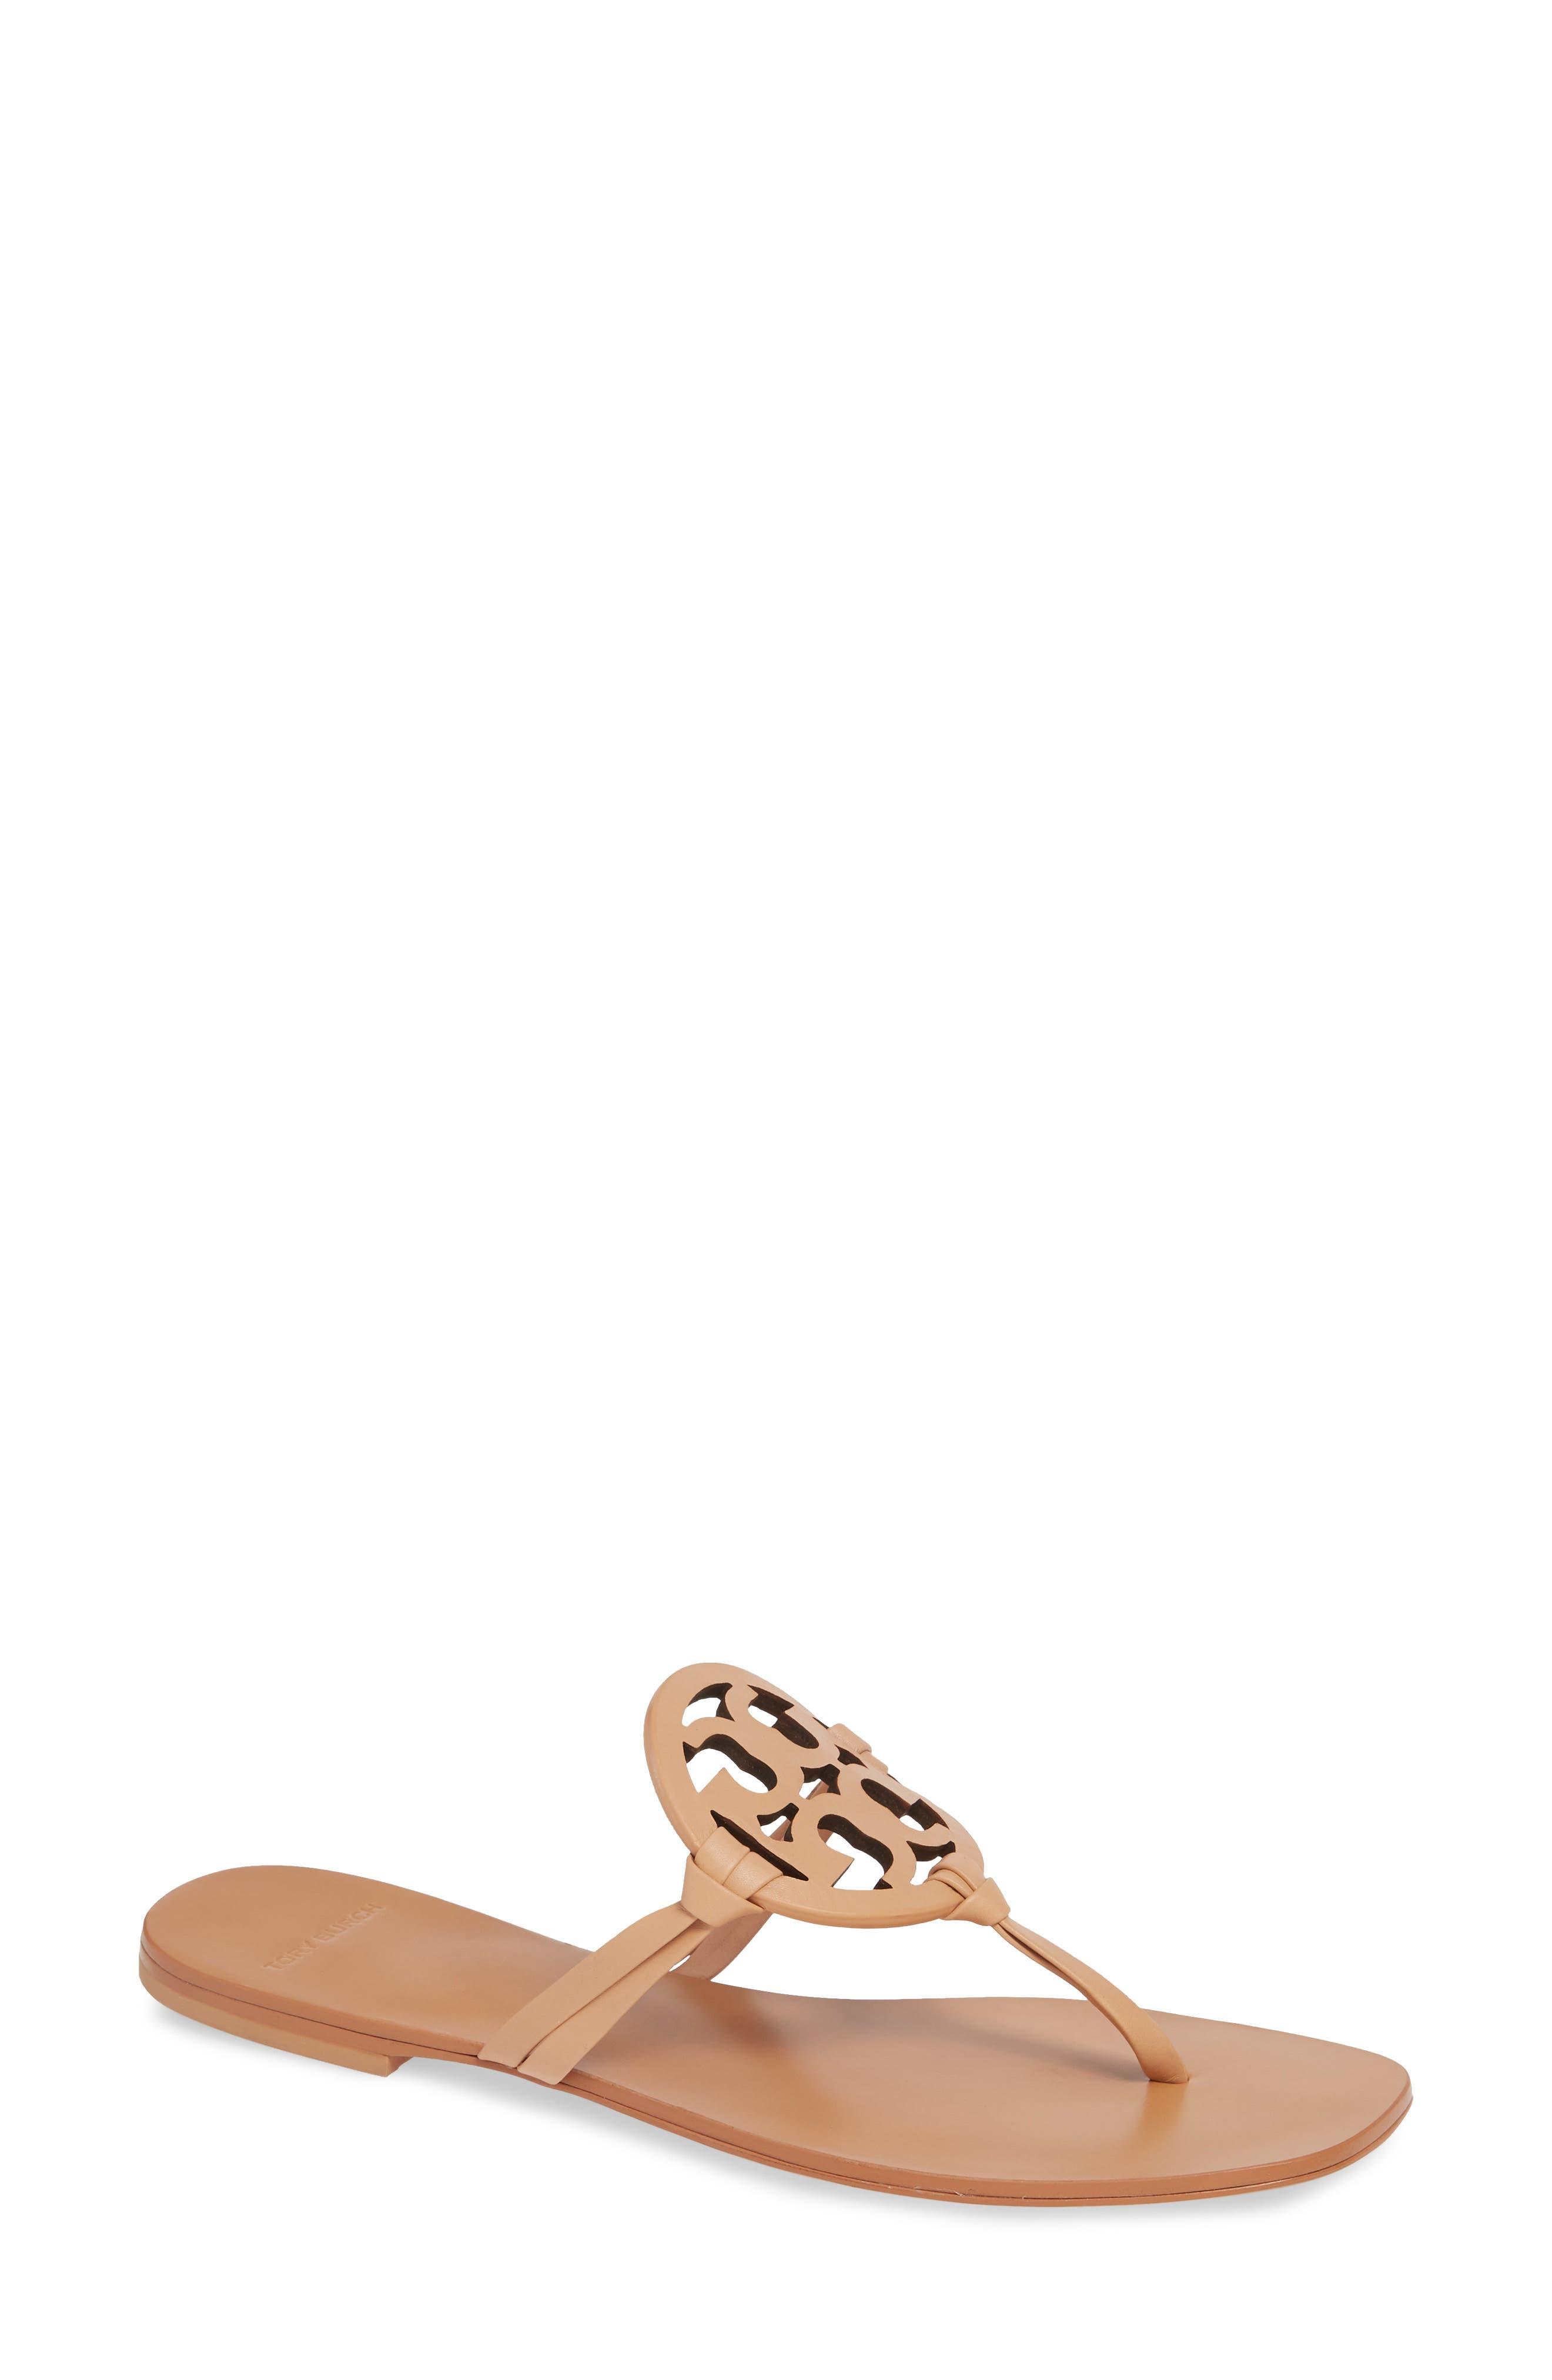 Tory Burch Miller Square Toe Thong Sandal, Pink